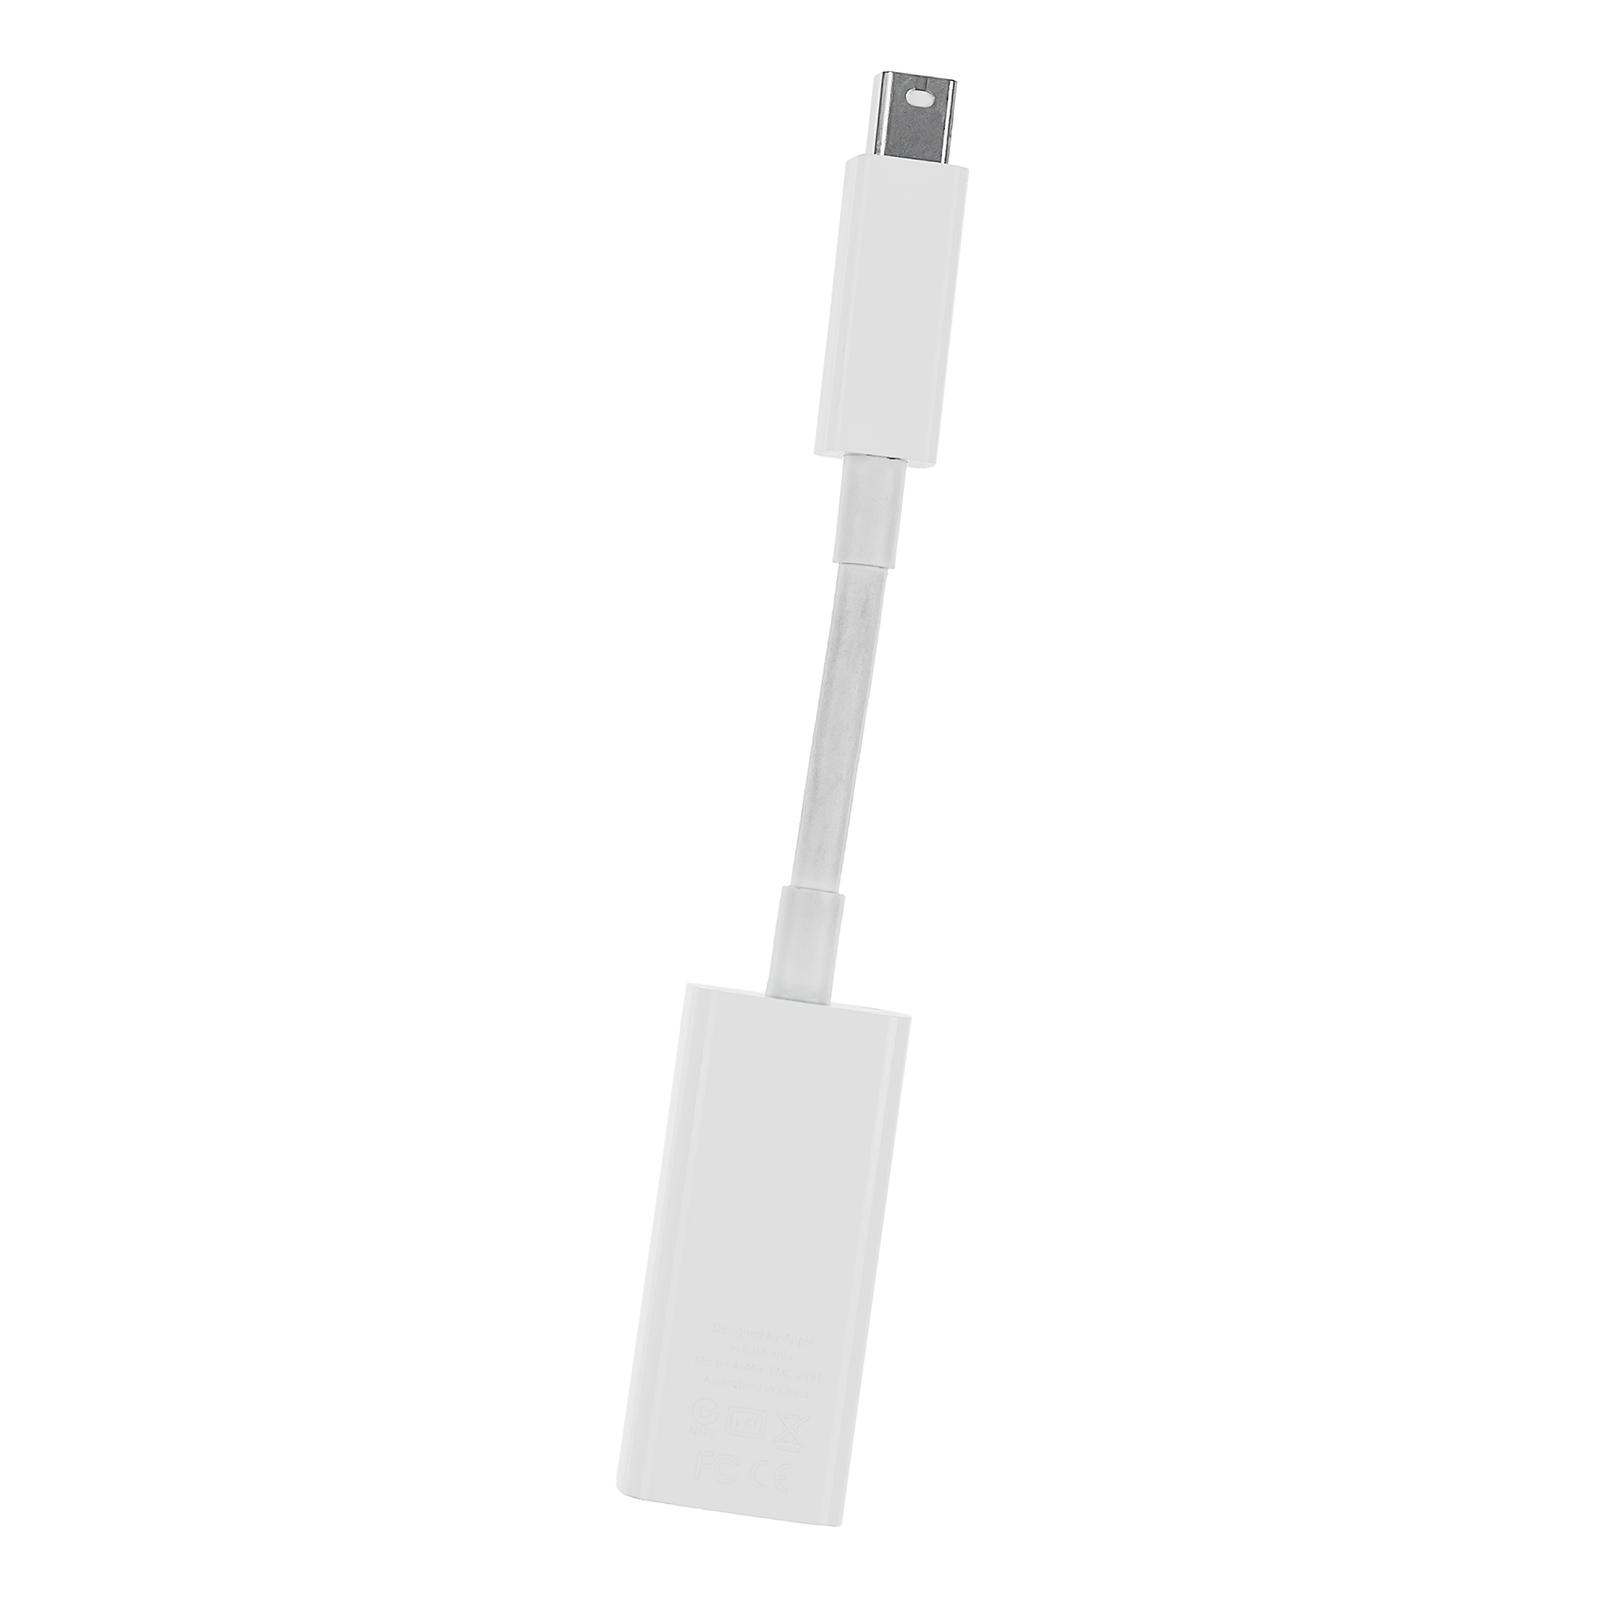 apple thunderbolt to firewire 800 adapter beetstech. Black Bedroom Furniture Sets. Home Design Ideas